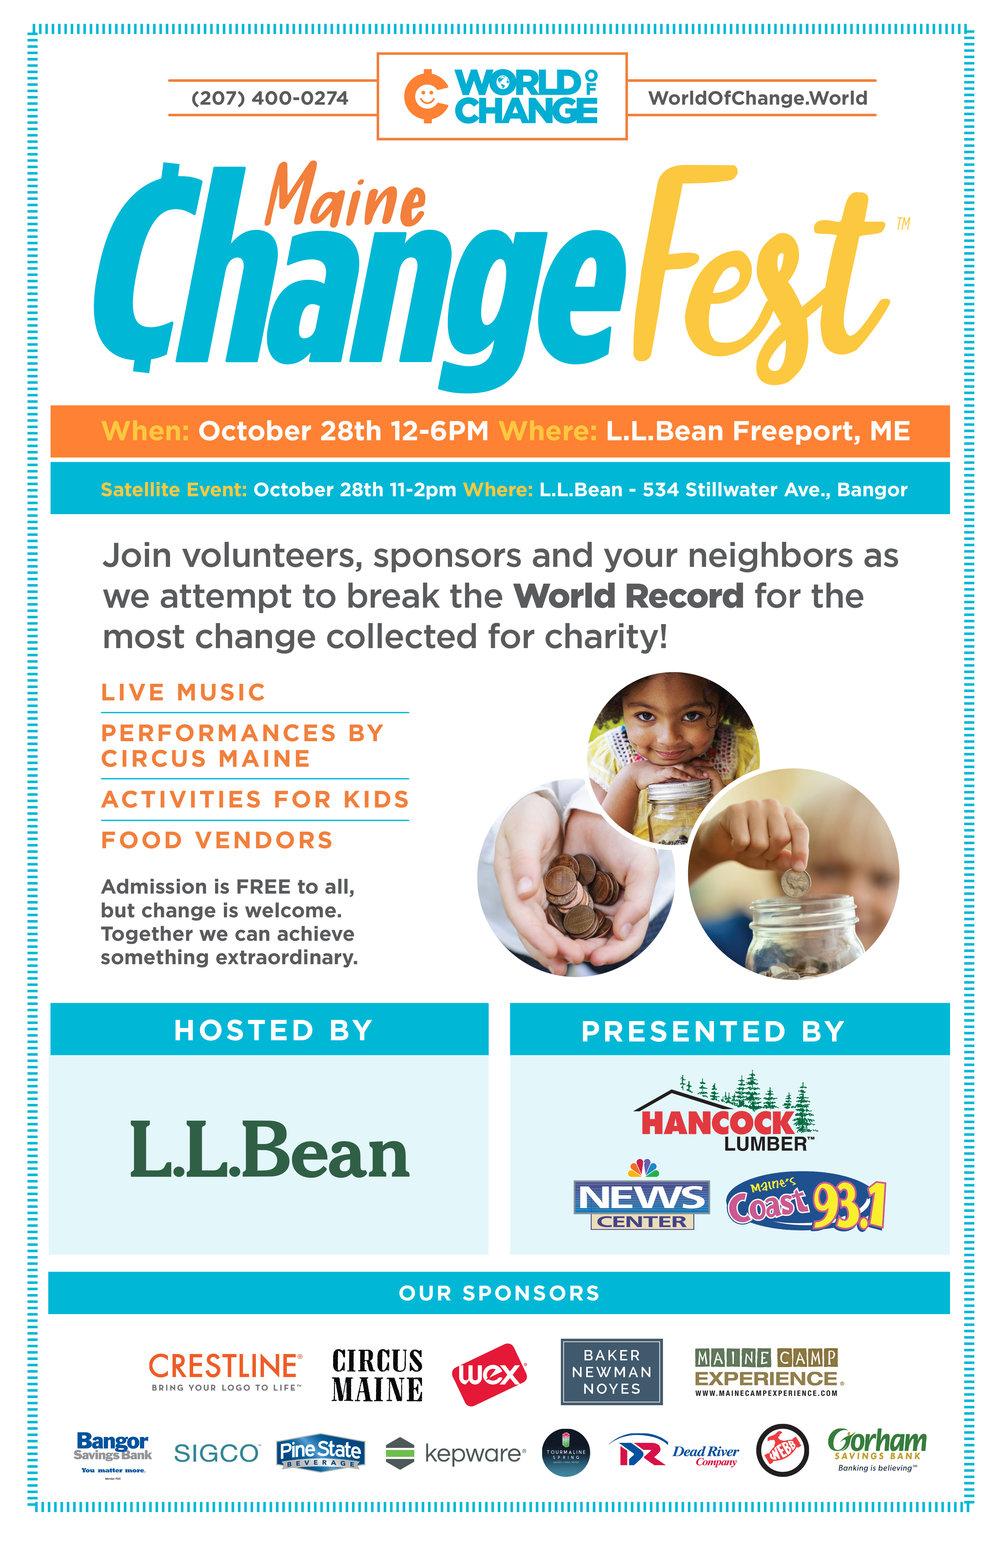 WOC_ChangeFest_Poster_Bangor.jpg